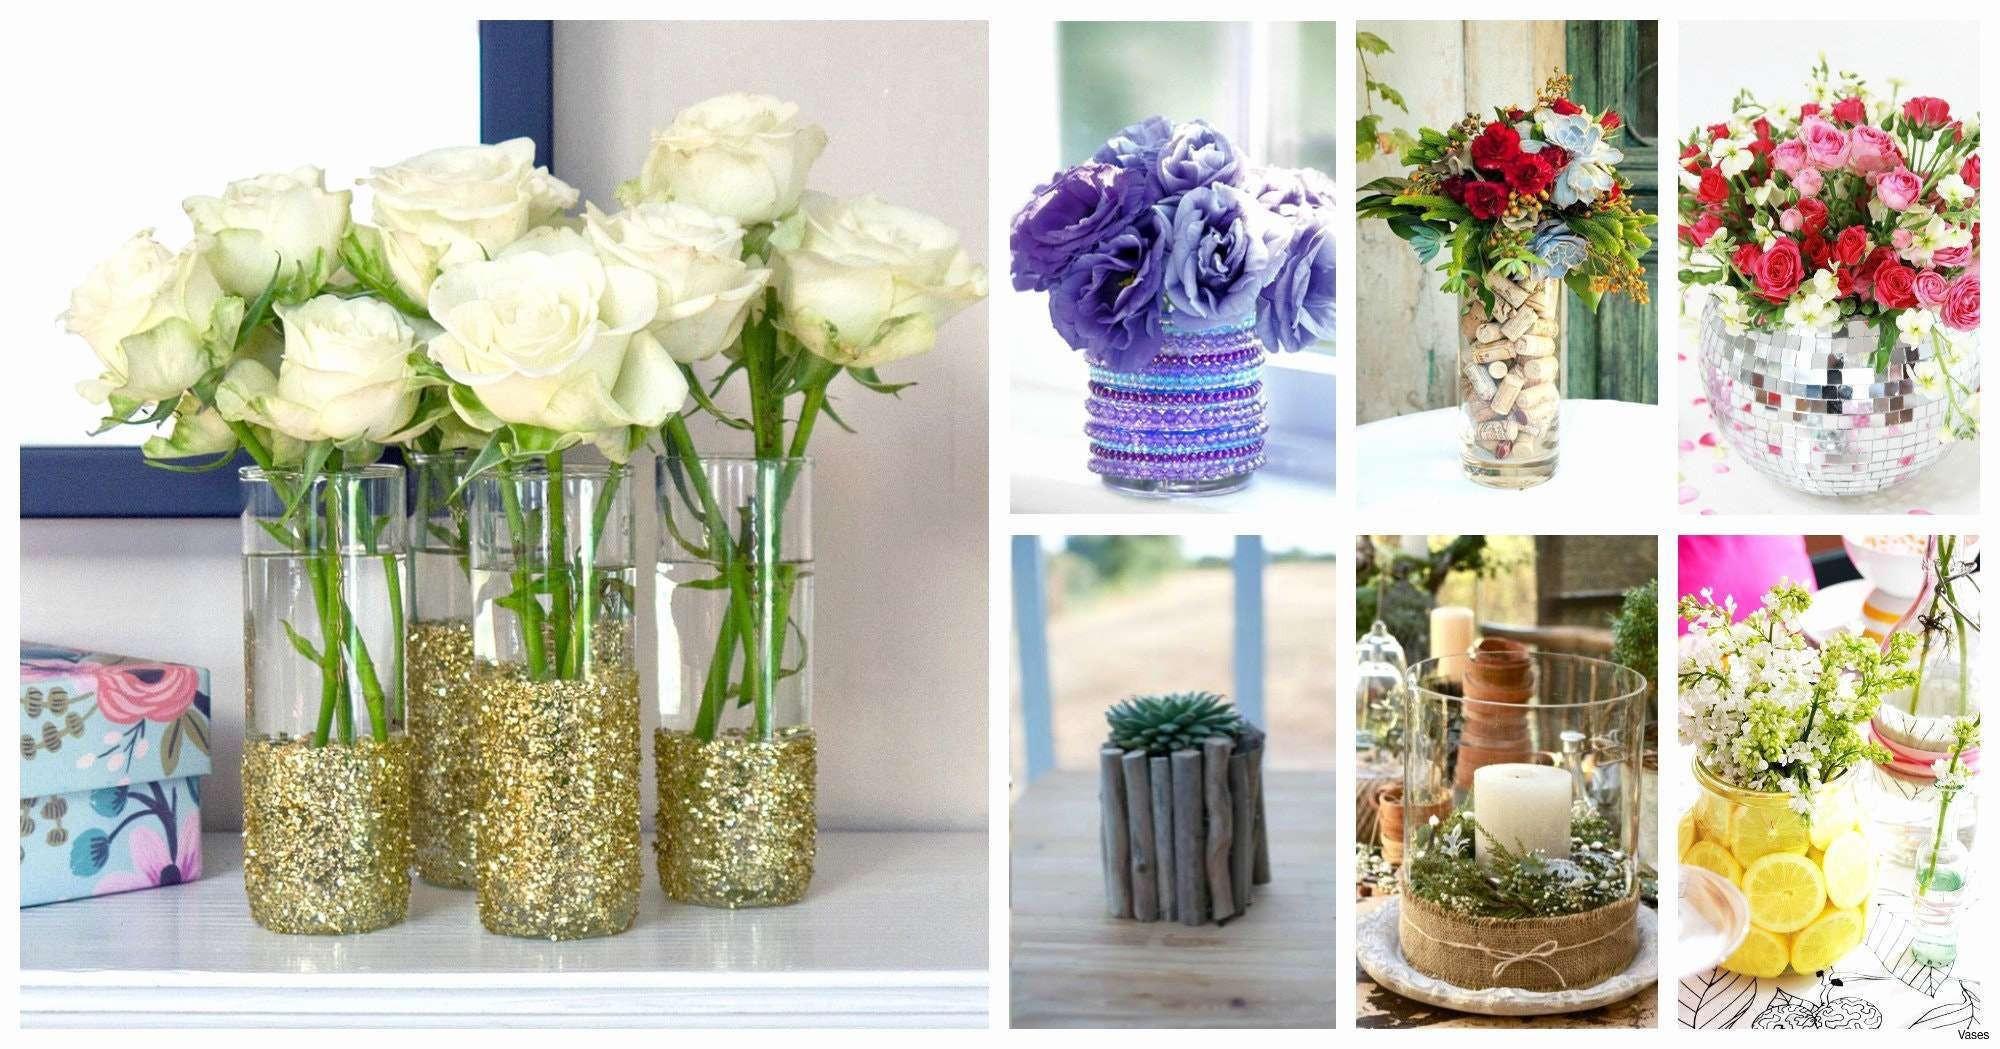 Diy Vase Decor Of White Vase Sets Pics Diy Home Decor Vaseh Vases Decorative Flower Pertaining to Diy Home Decor Vaseh Vases Decorative Flower Ideas I 0d Design